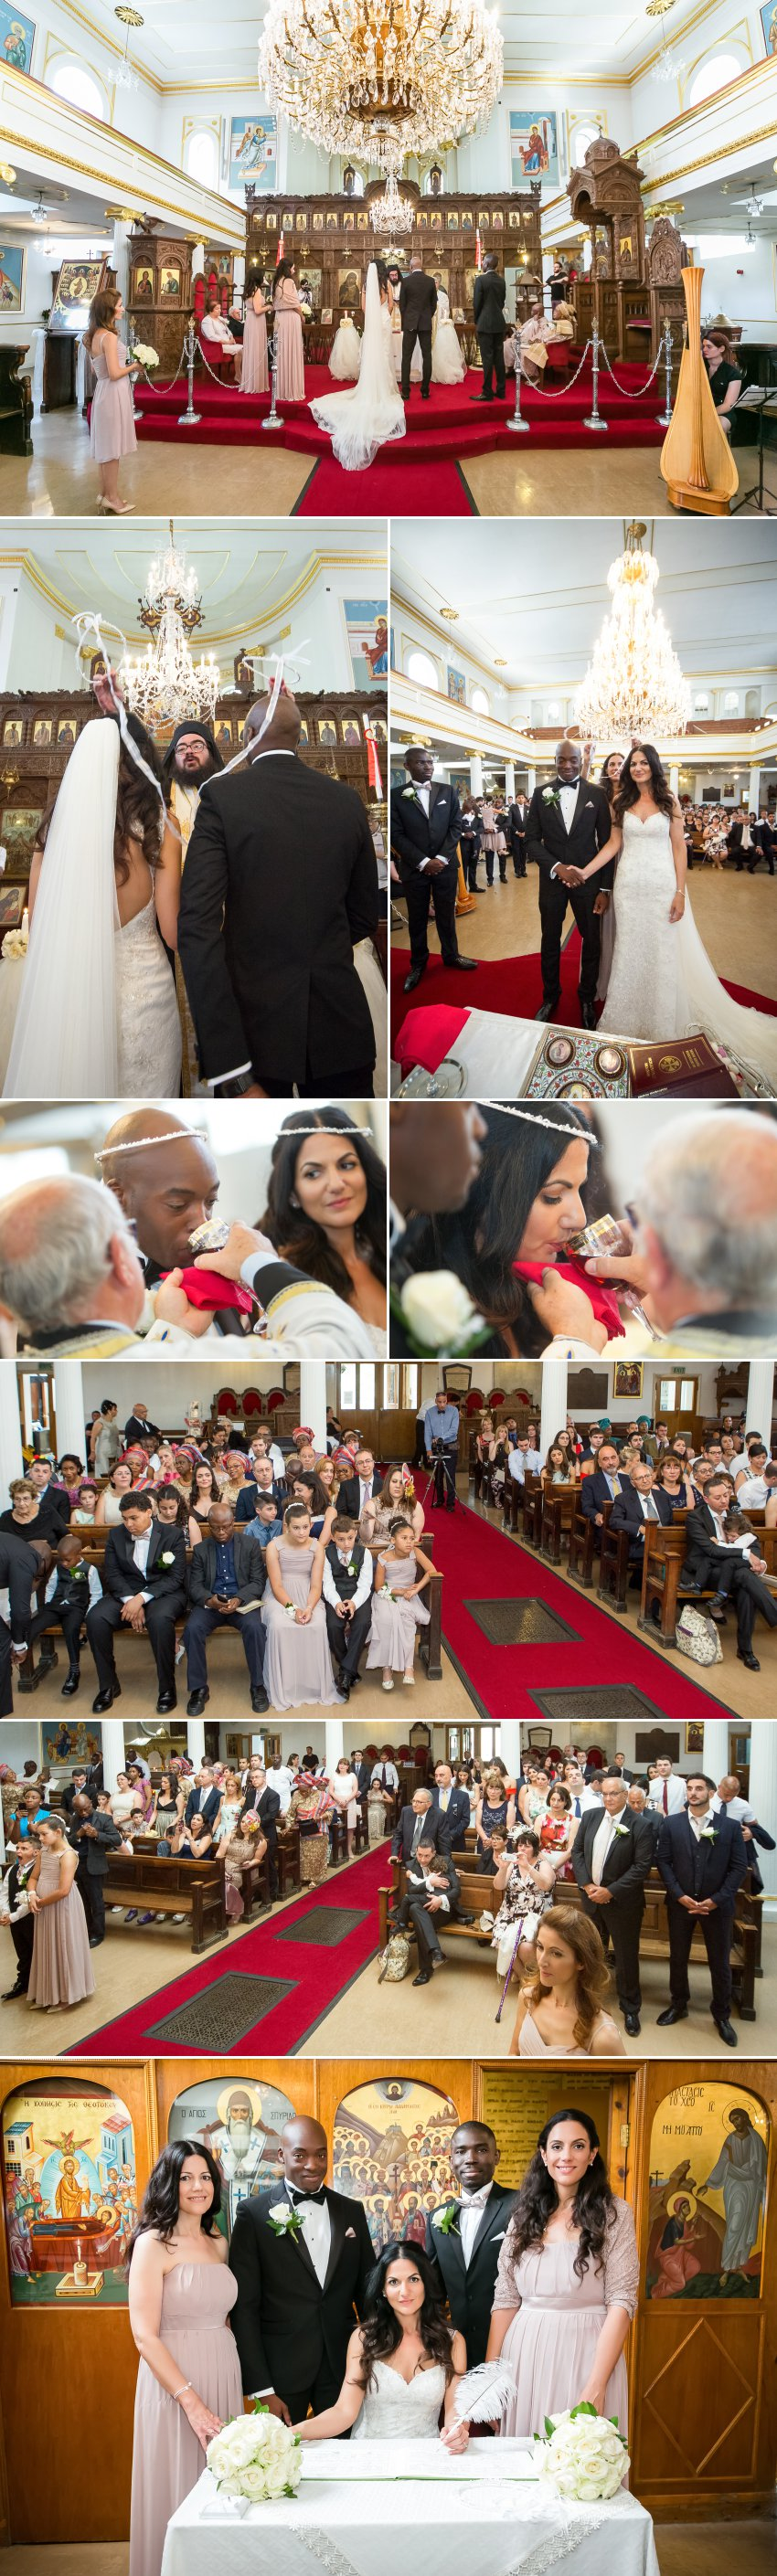 10 Nigerian wedding at Rosewood Hotel